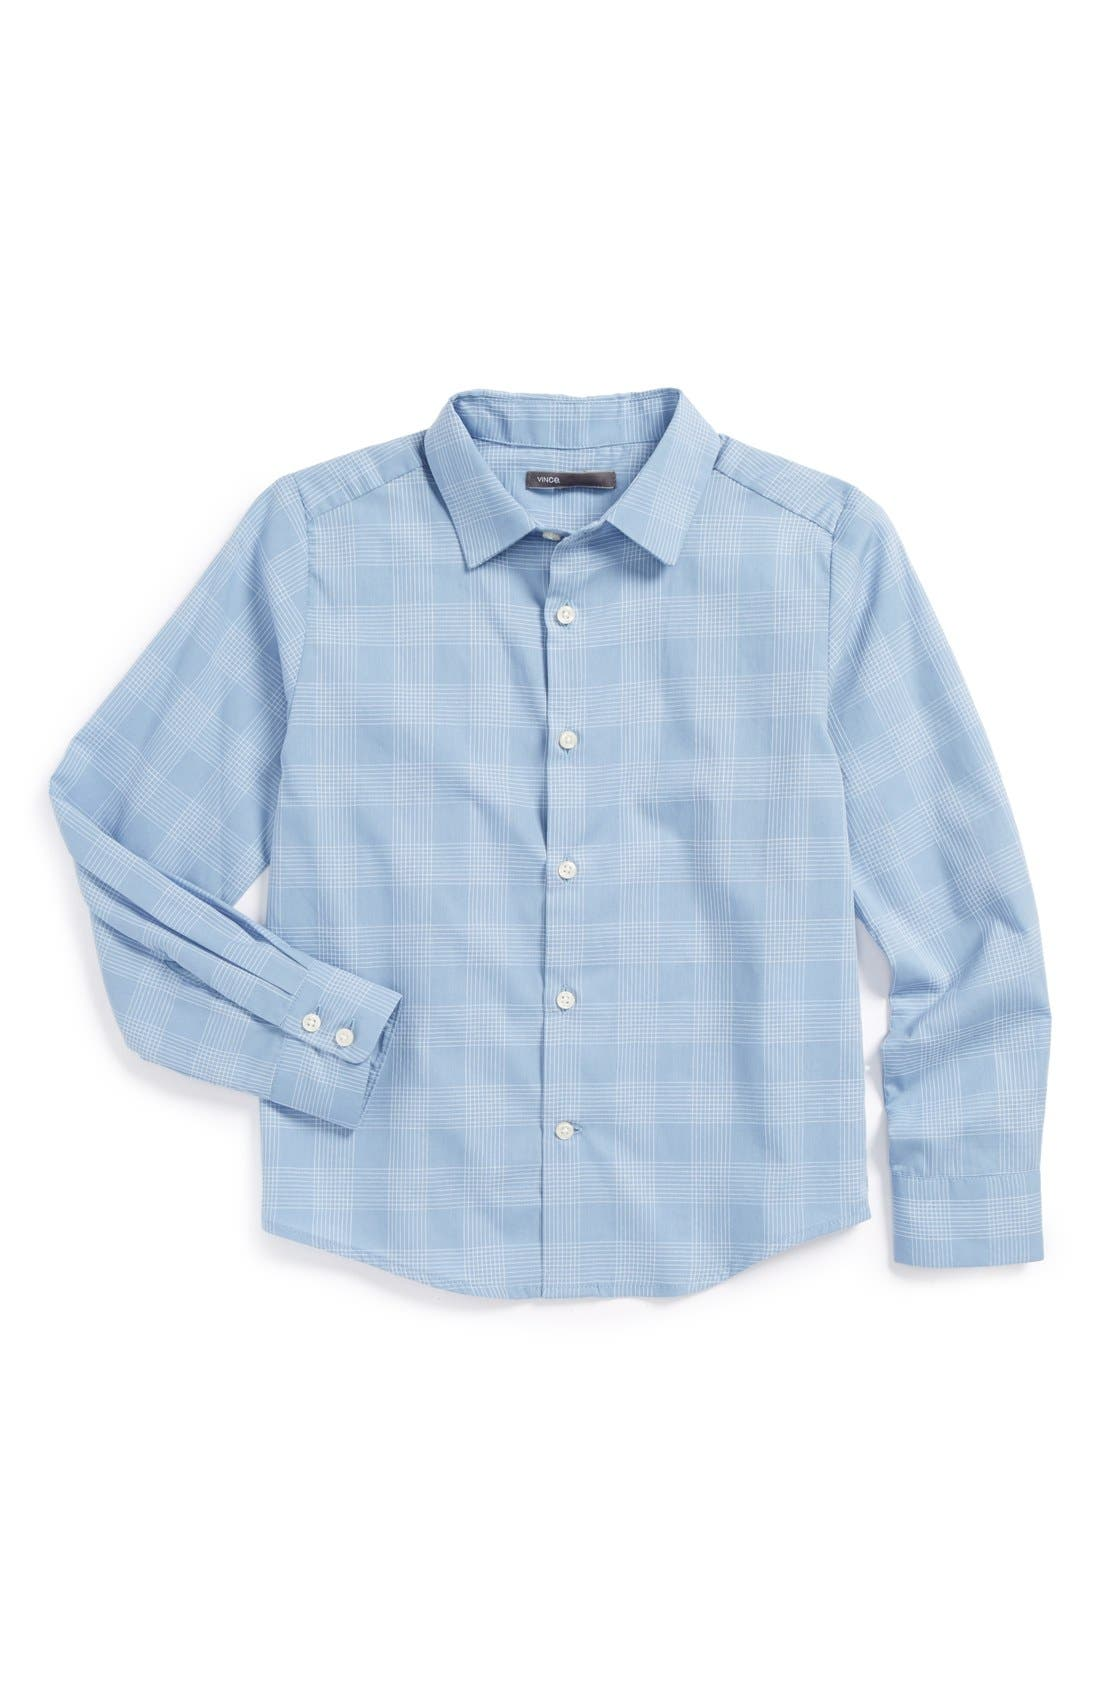 Alternate Image 1 Selected - Vince 'Dobby' Cotton Sport Shirt (Big Boys)